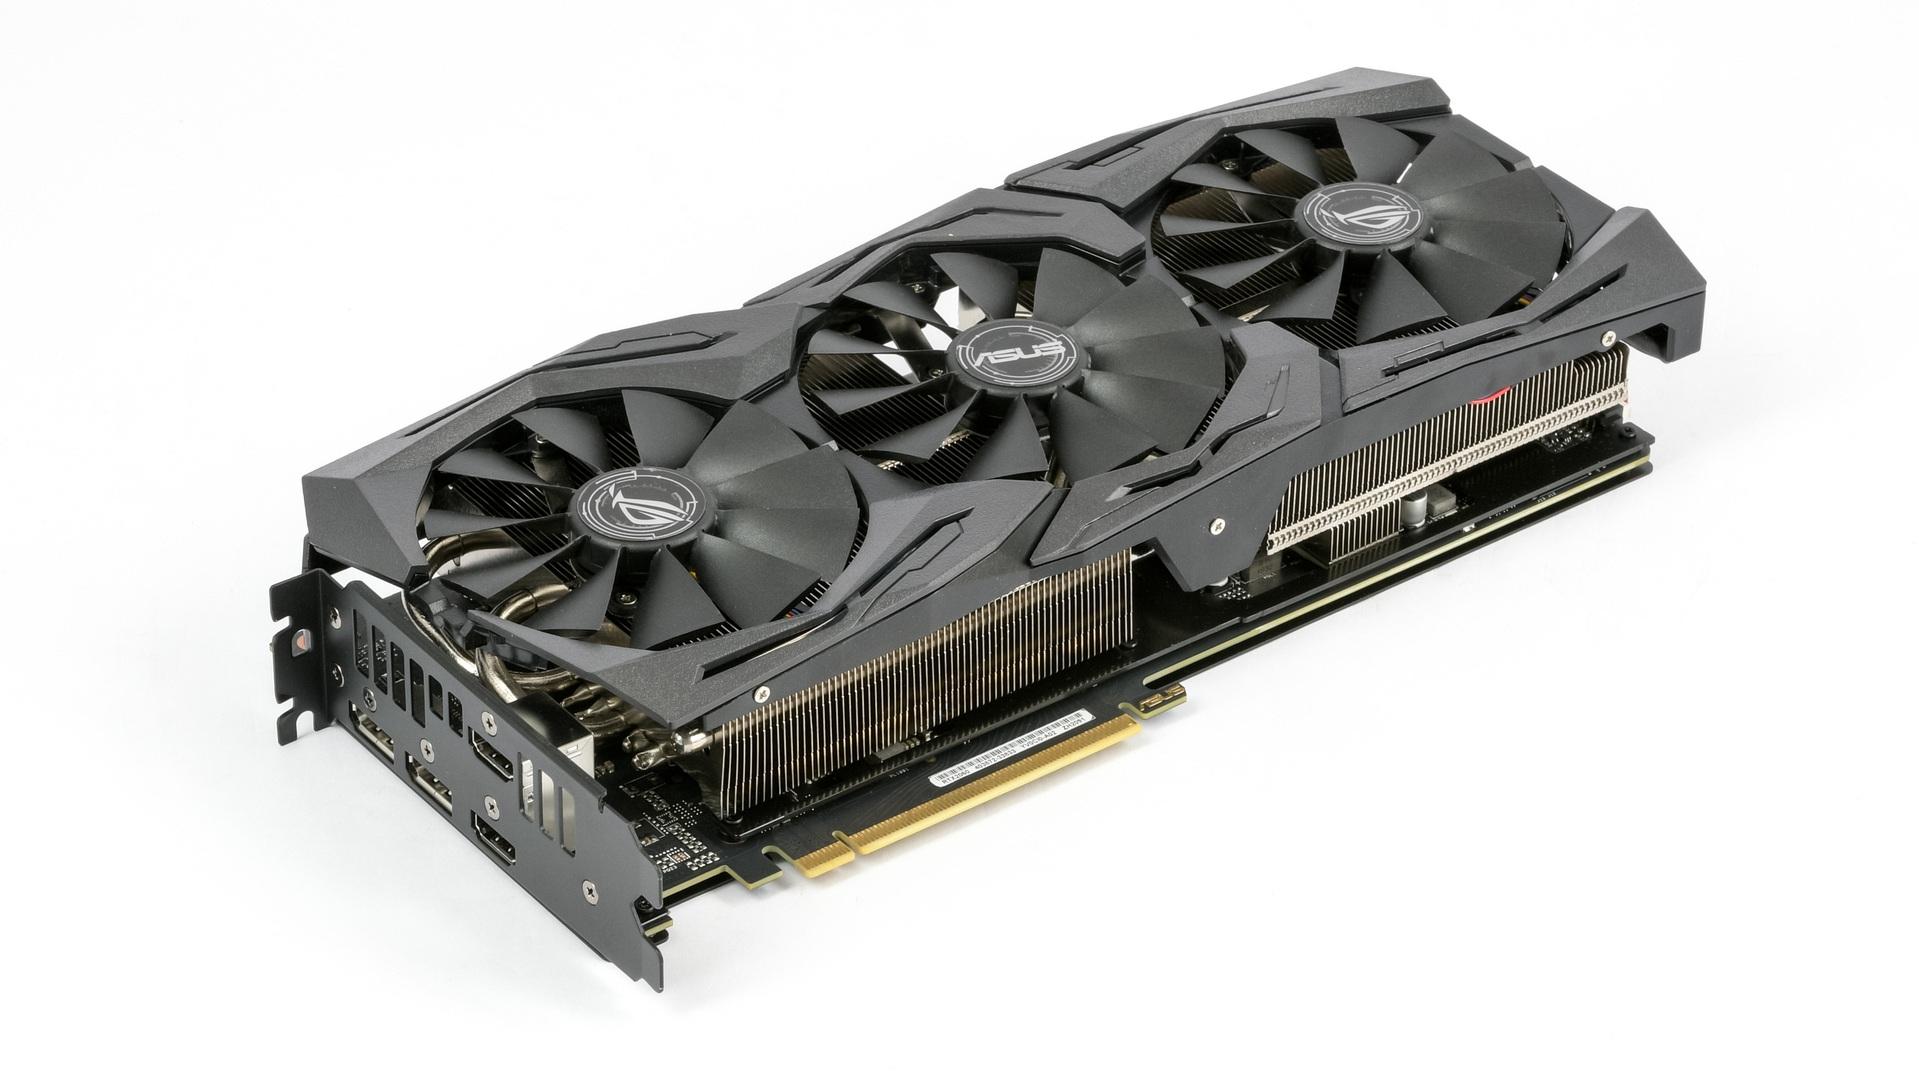 Asus ROG Strix GeForce RTX 2060 O6G Gaming v testu